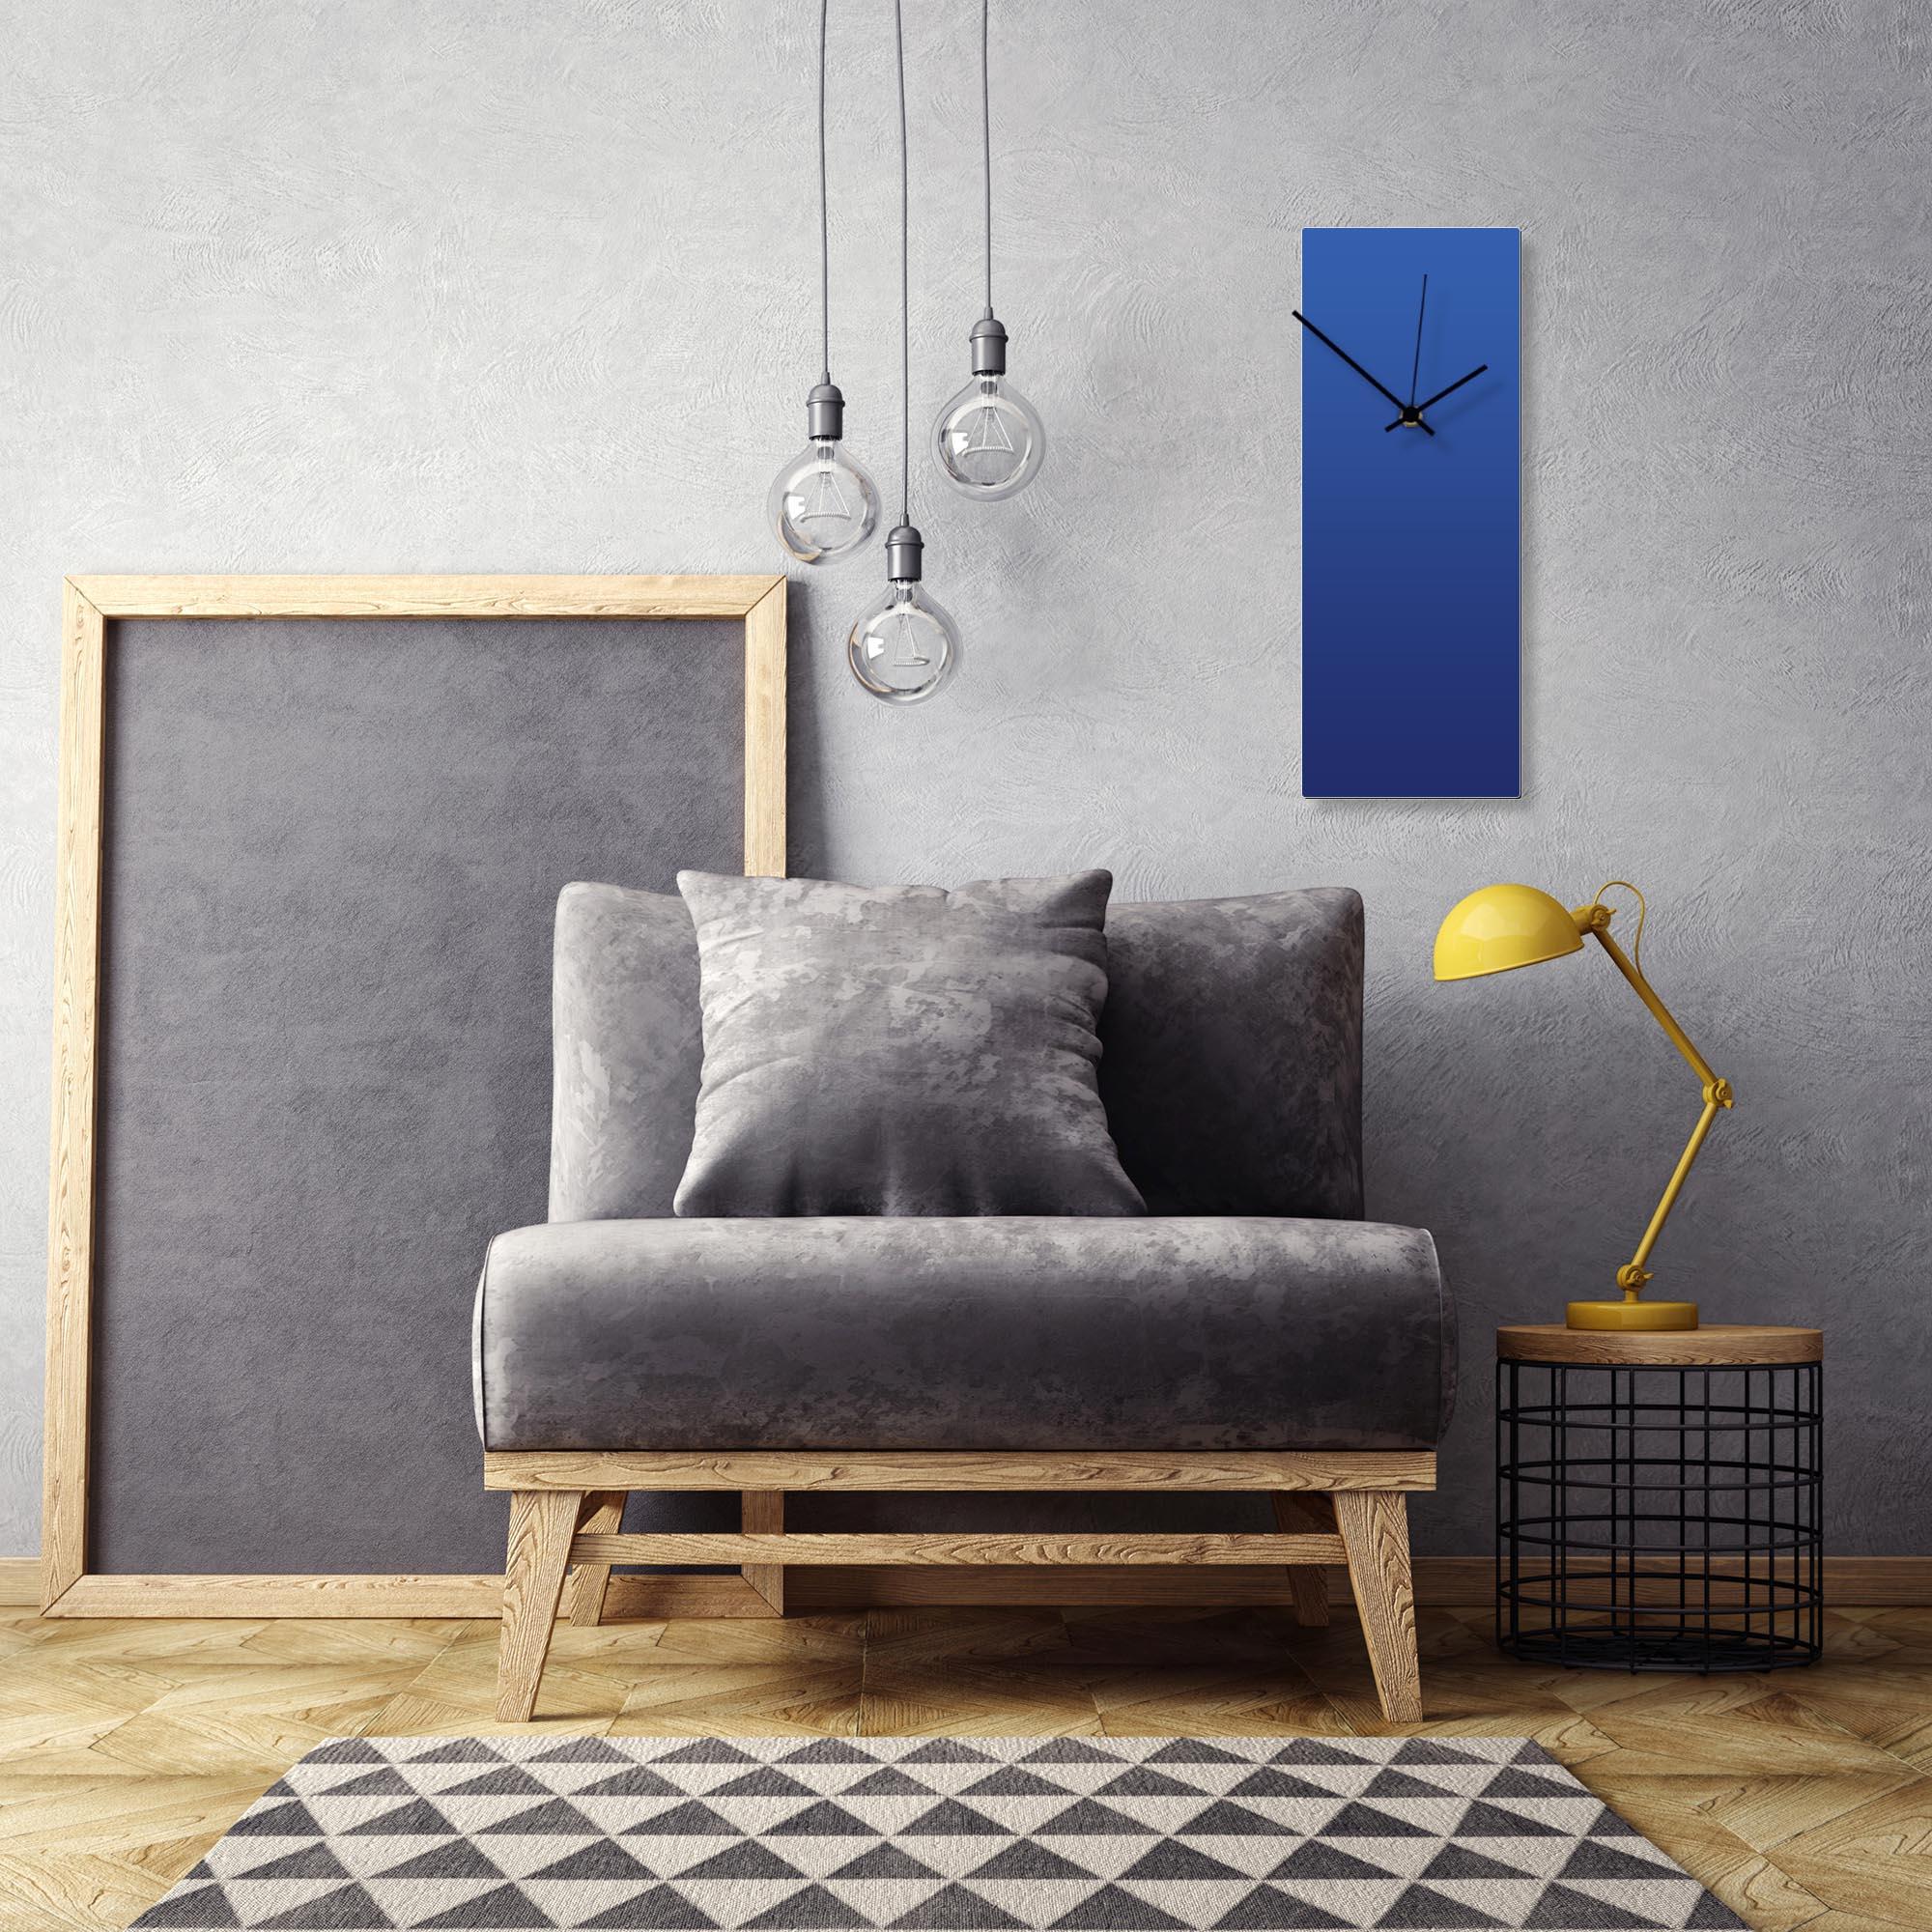 Blueout Black Clock Large by Adam Schwoeppe Contemporary Clock on Aluminum Polymetal - Alternate View 1